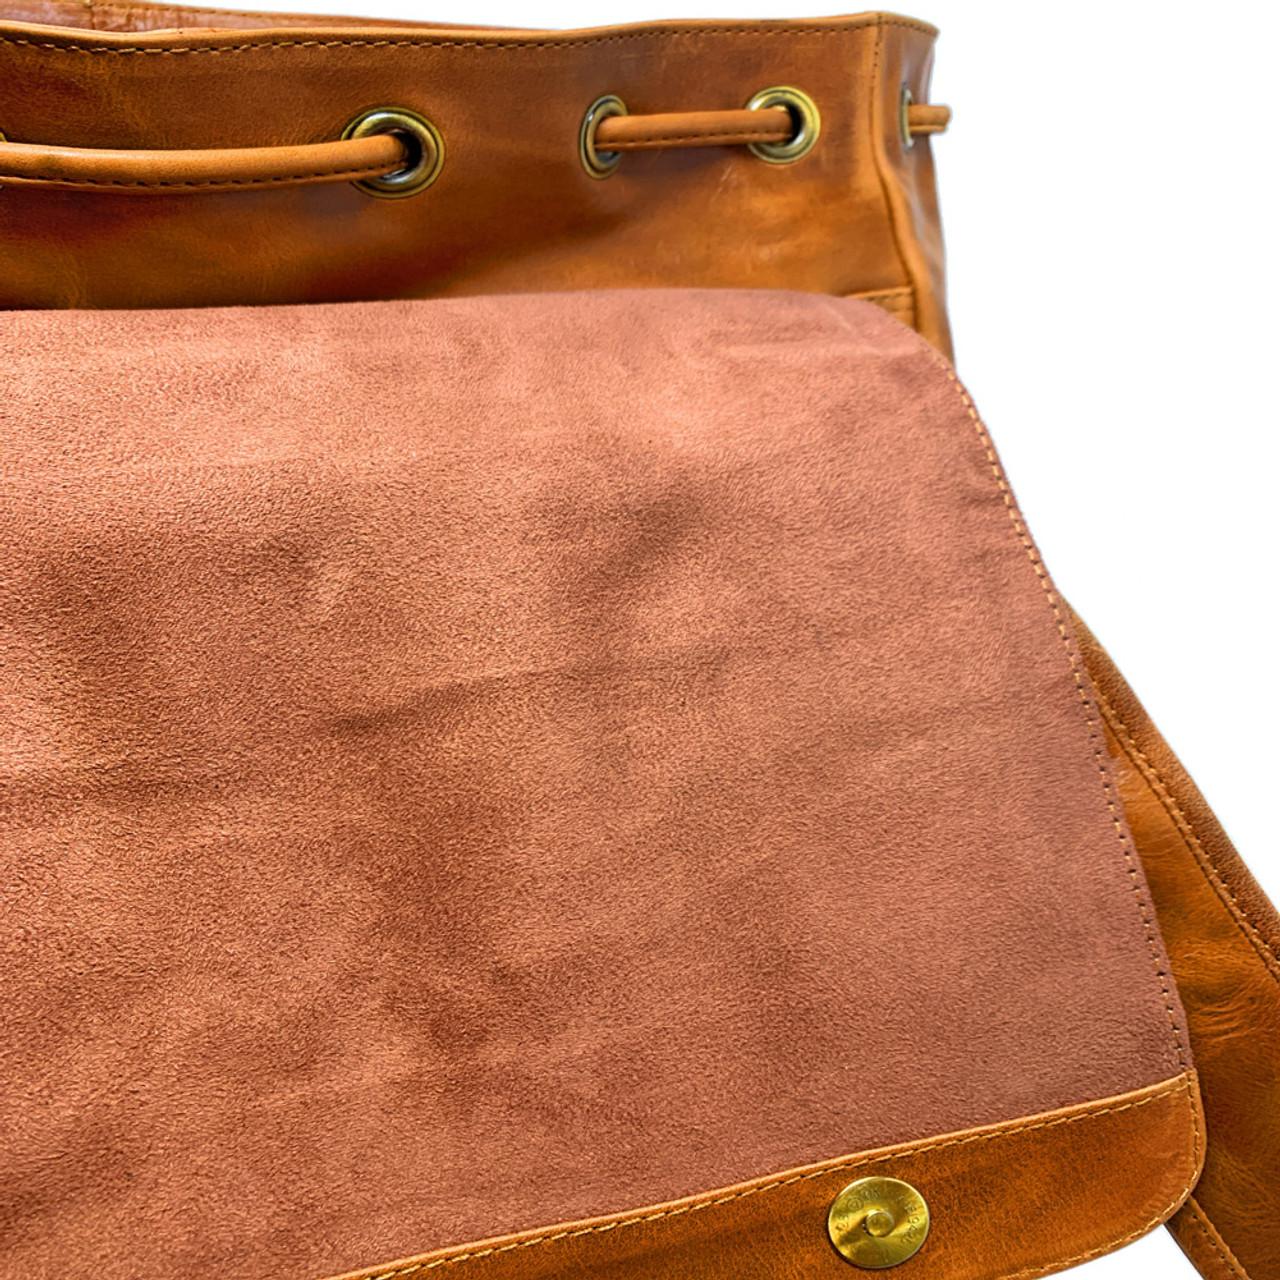 Alabama Crimson Tide Bama Leather Rucksack Tan Westbridge Backpack